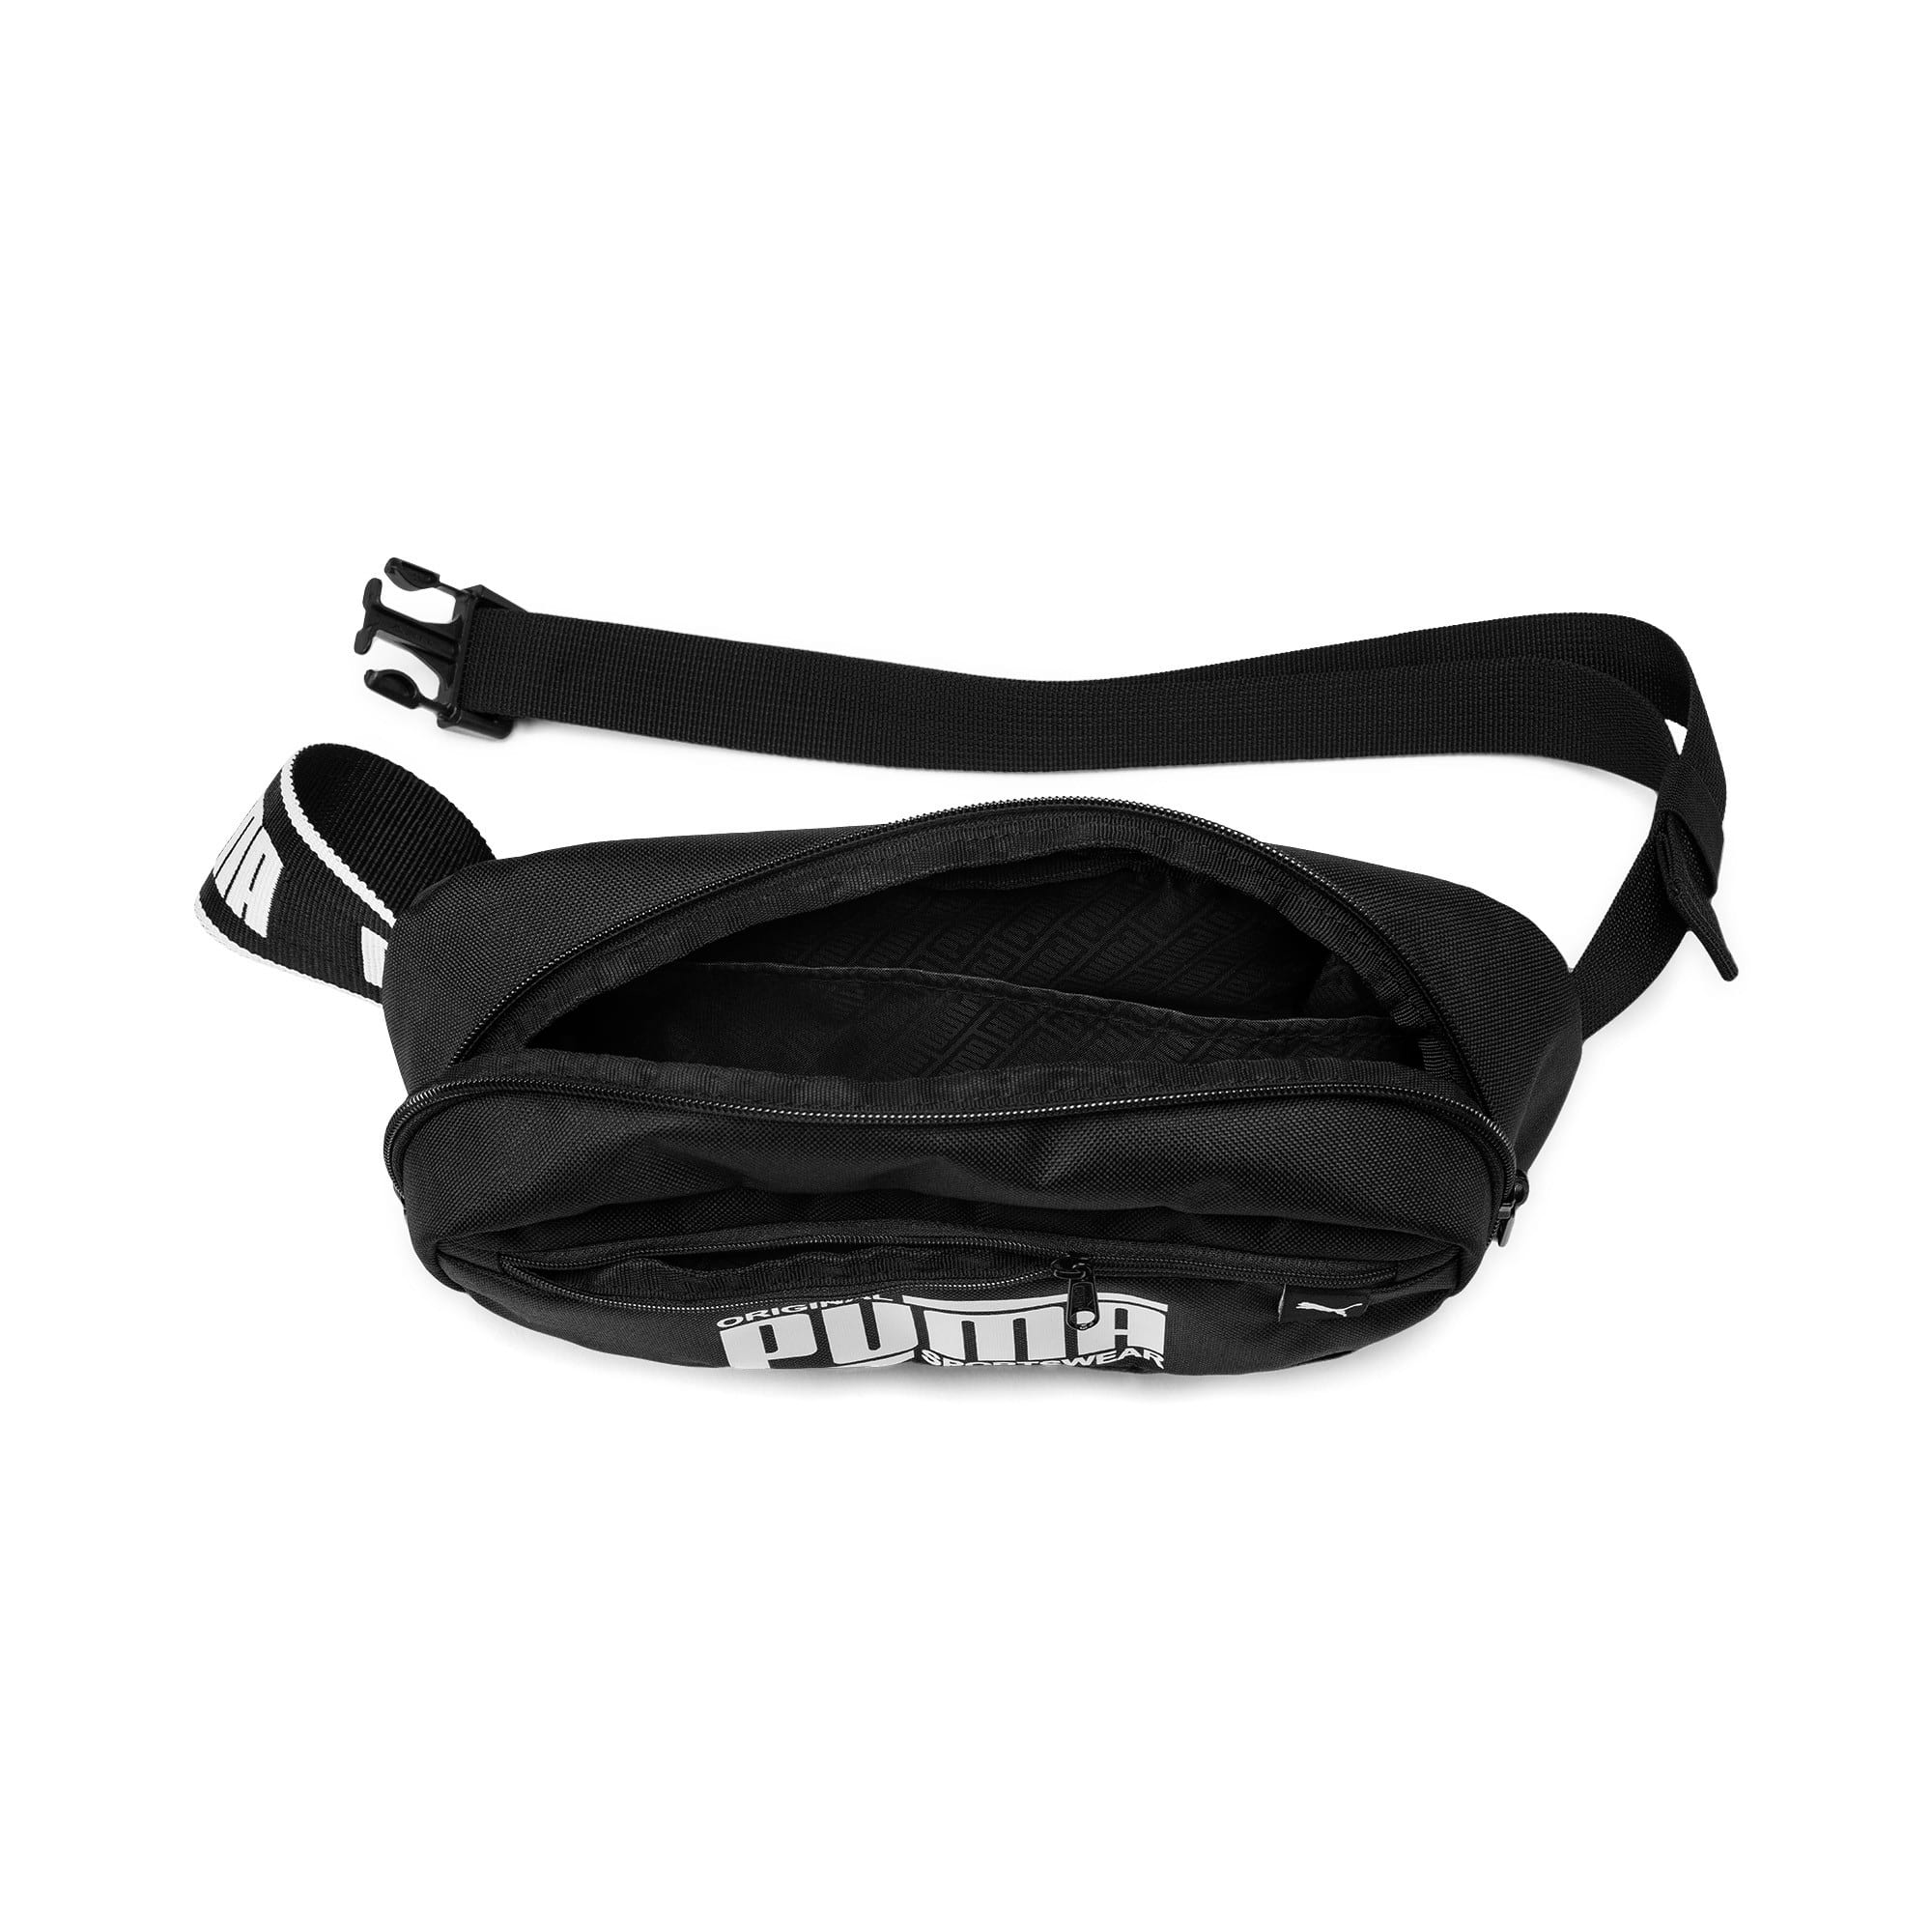 Thumbnail 3 of Sole Waist Bag, Puma Black, medium